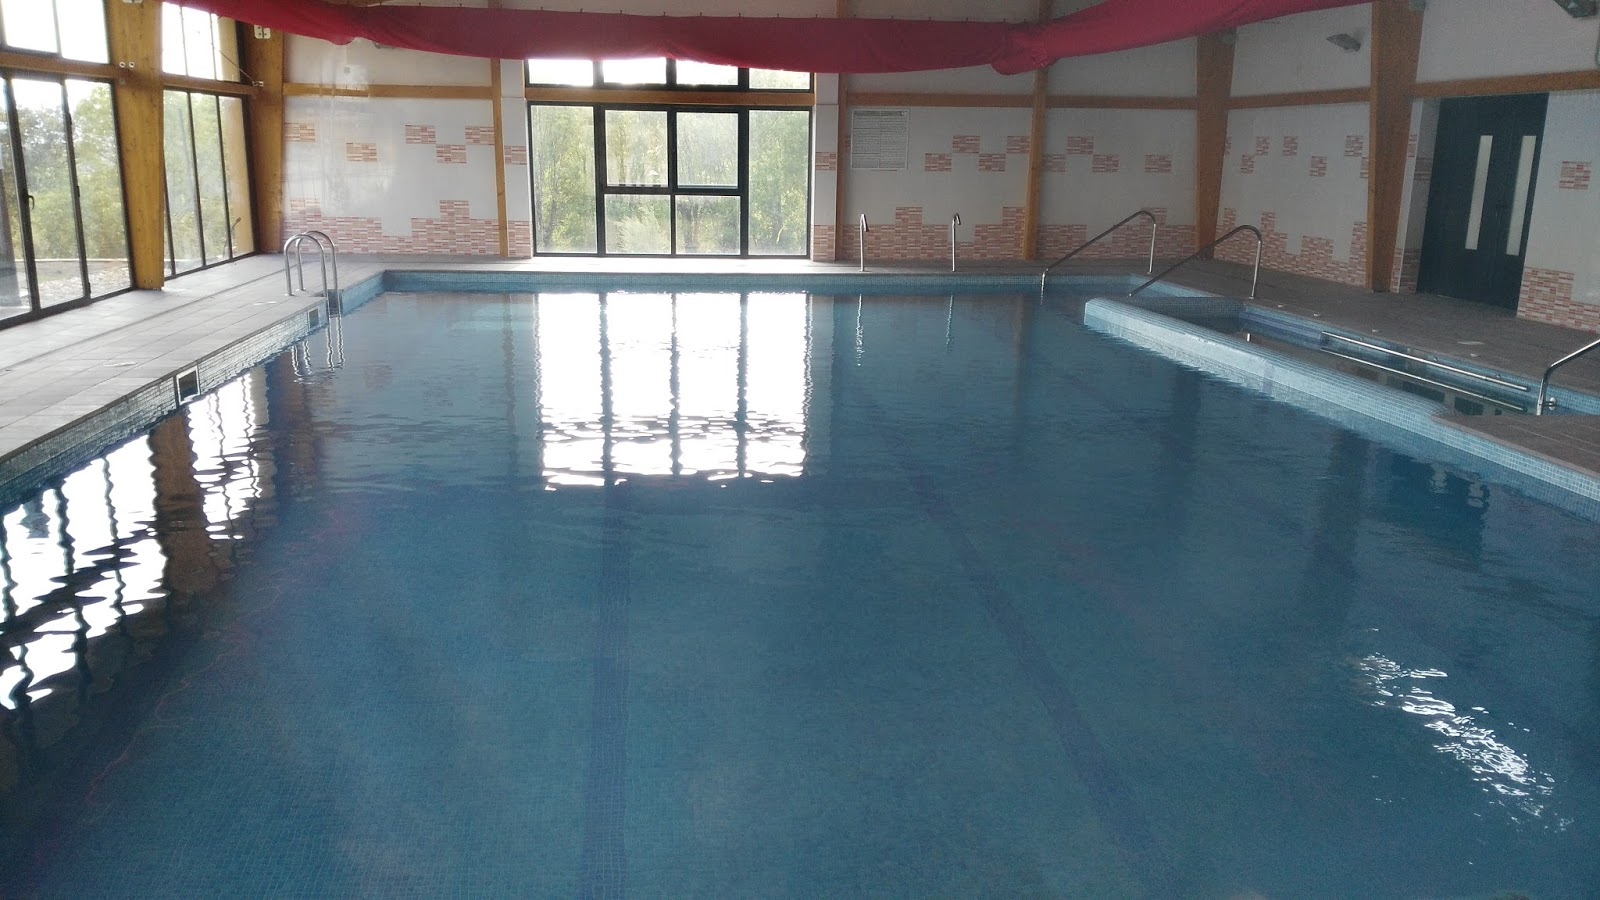 Albergue de berzosa piscina municipal en berzosa for Proyecto de piscina